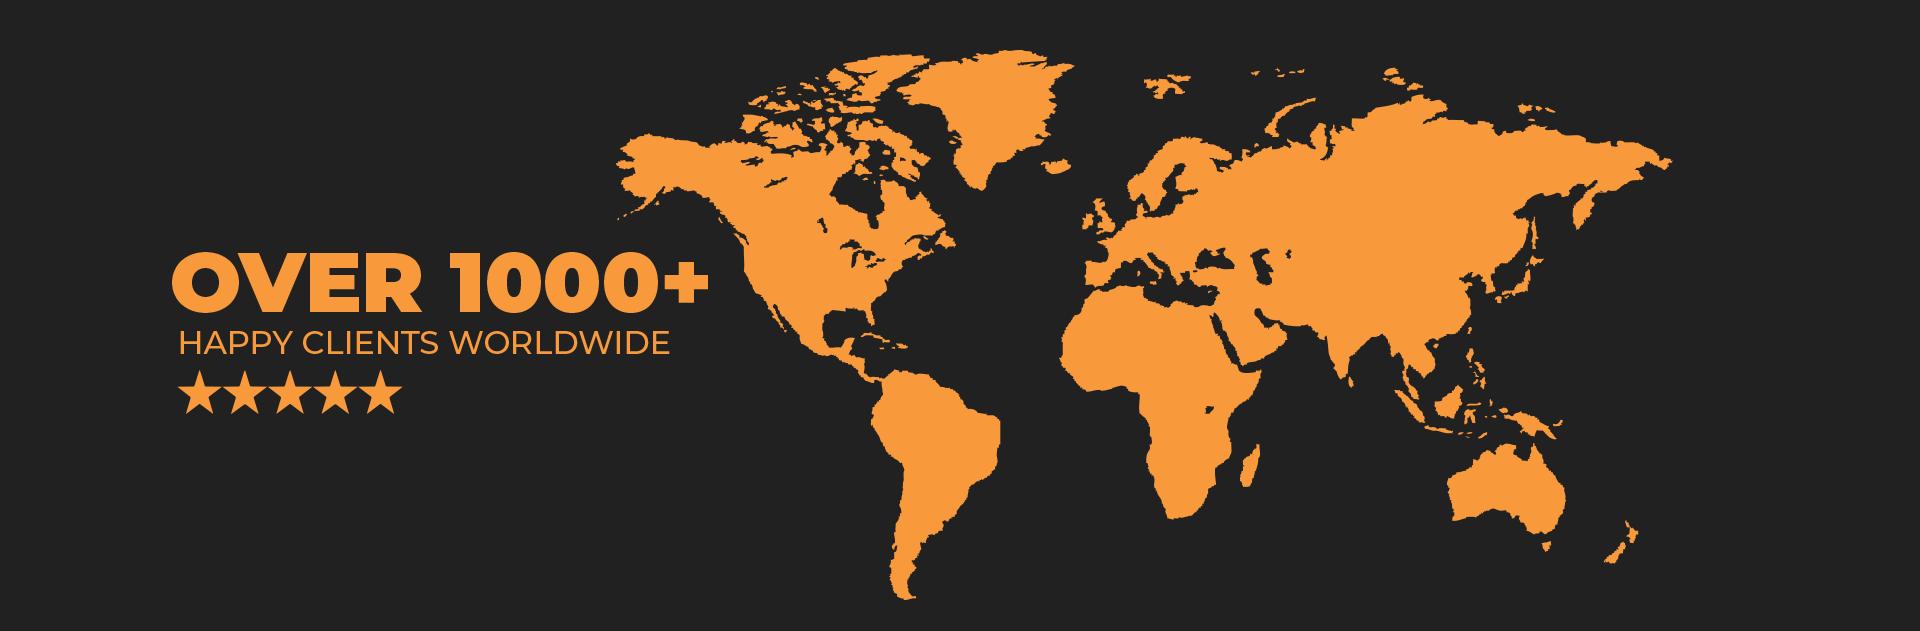 clients_worldwide